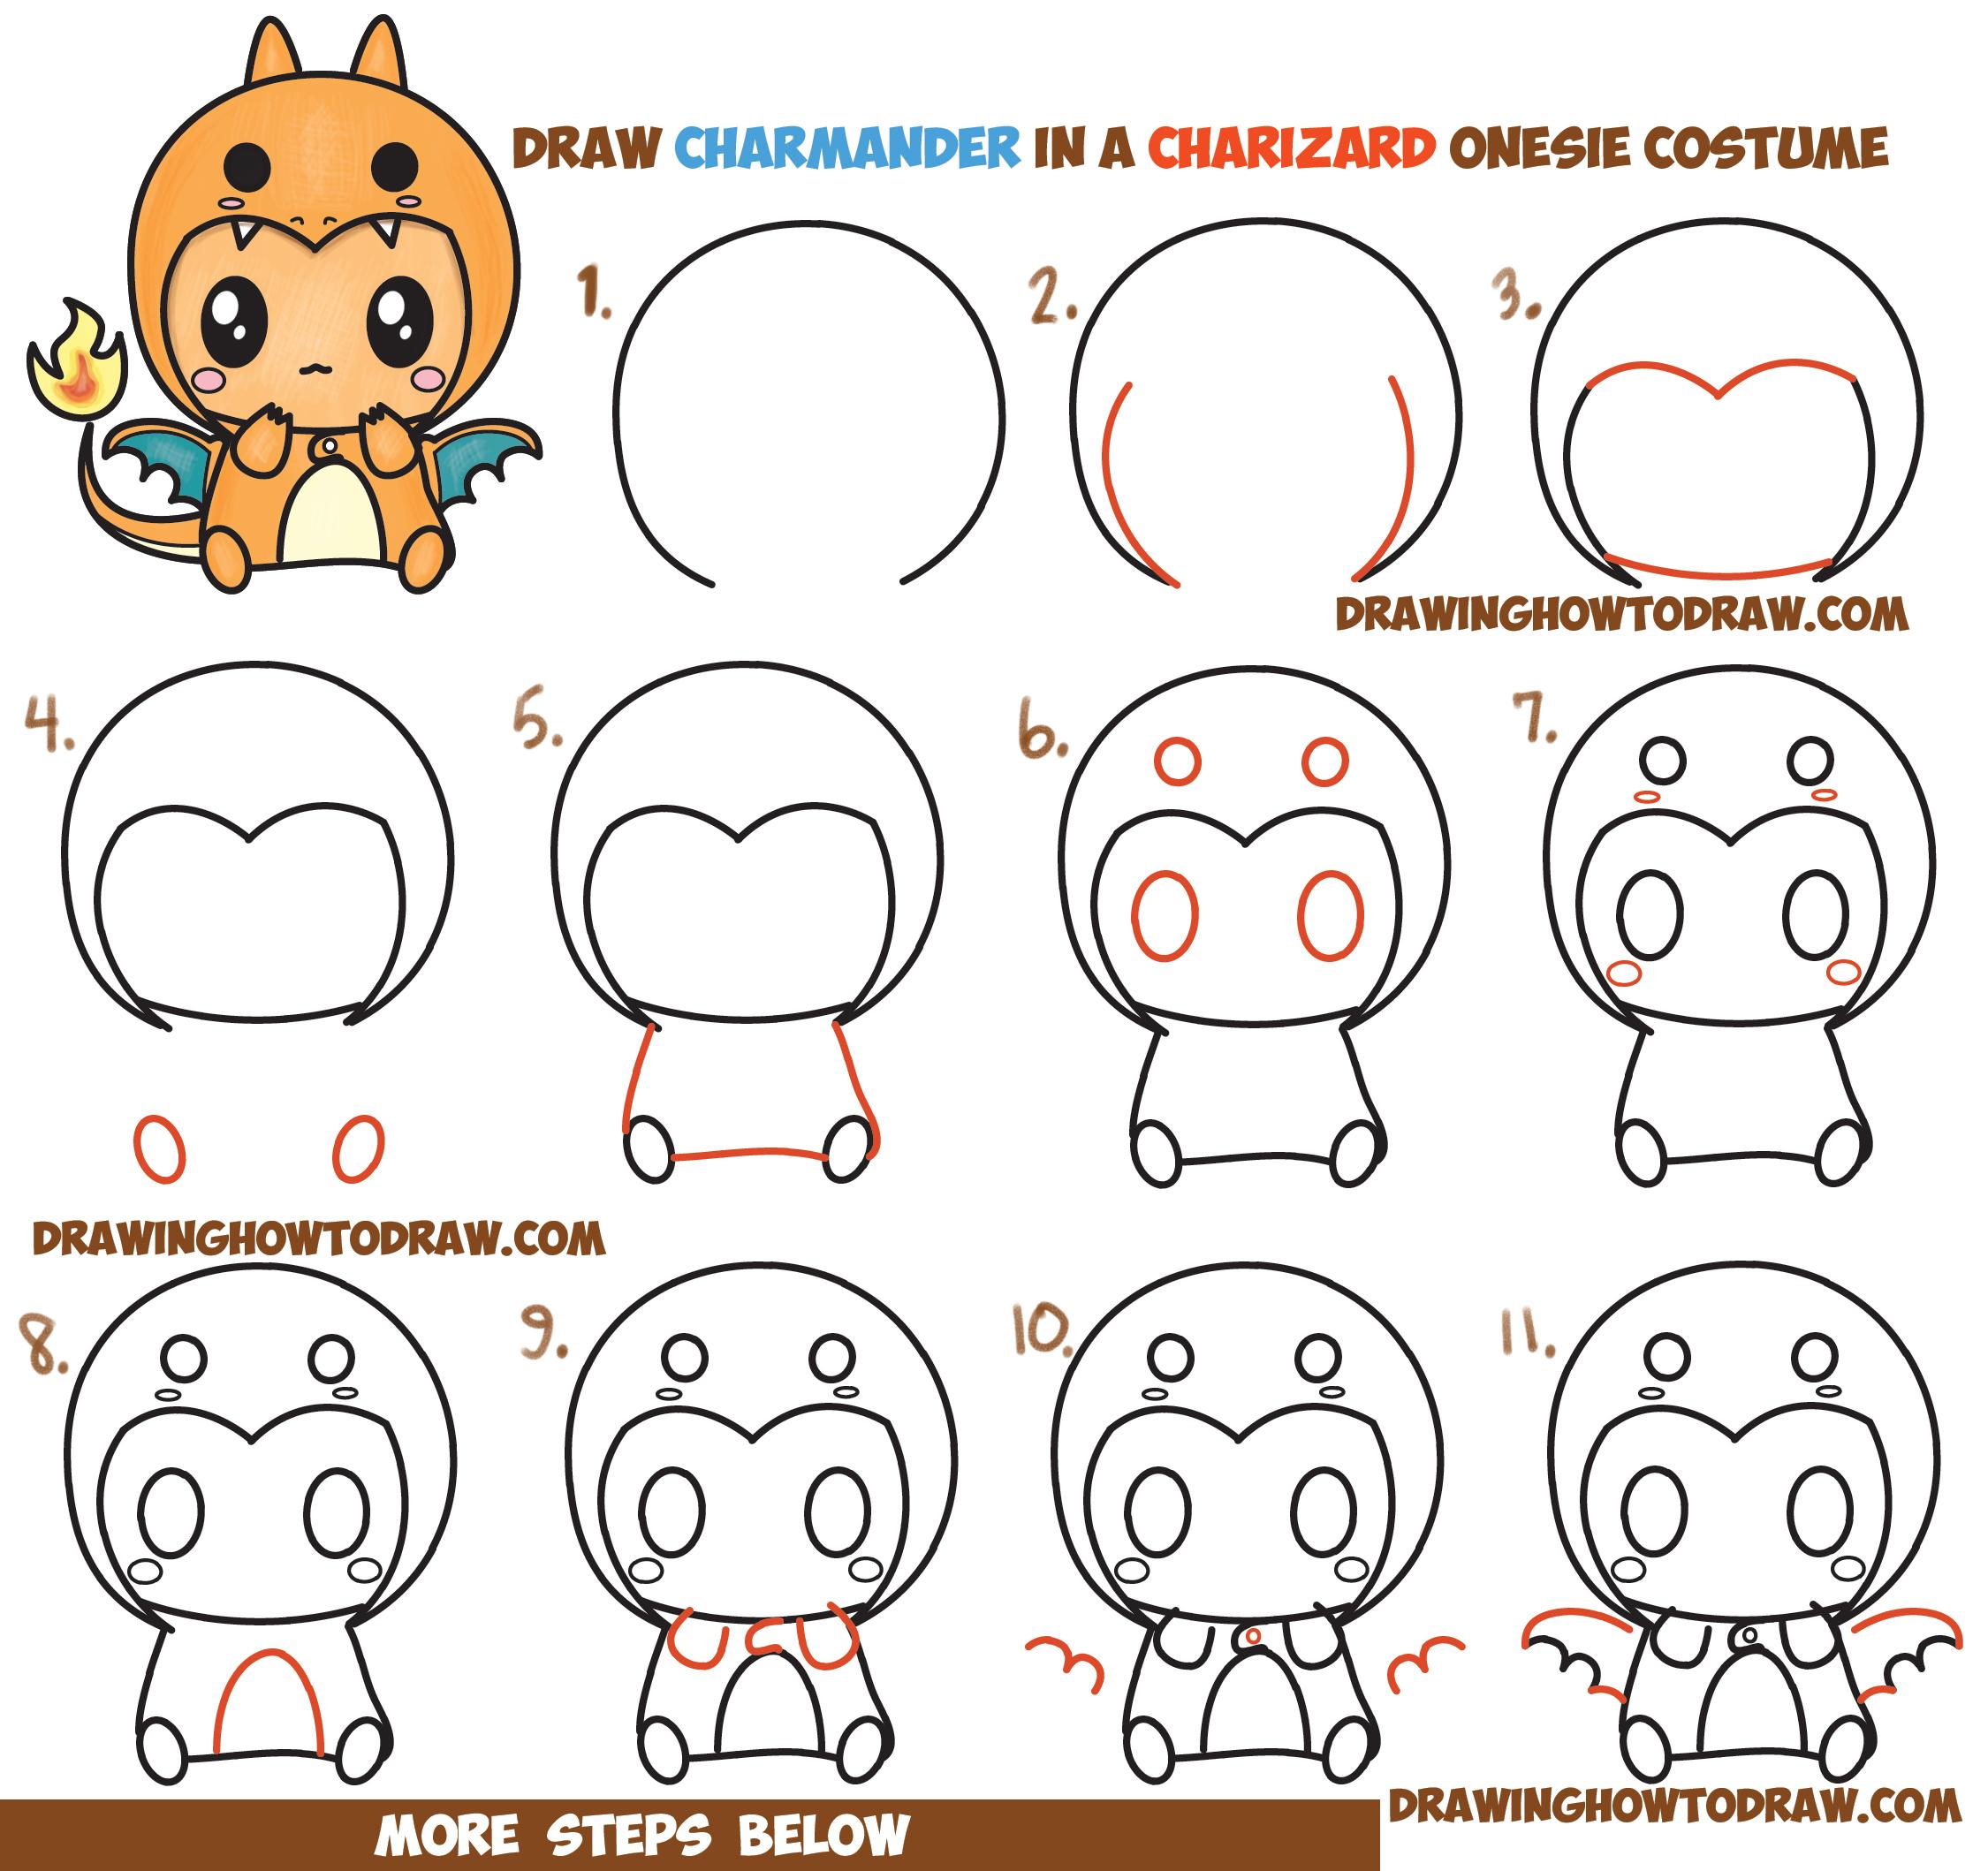 2250x2118 How To Draw Charmander Wearing Charizard Costume Onesie